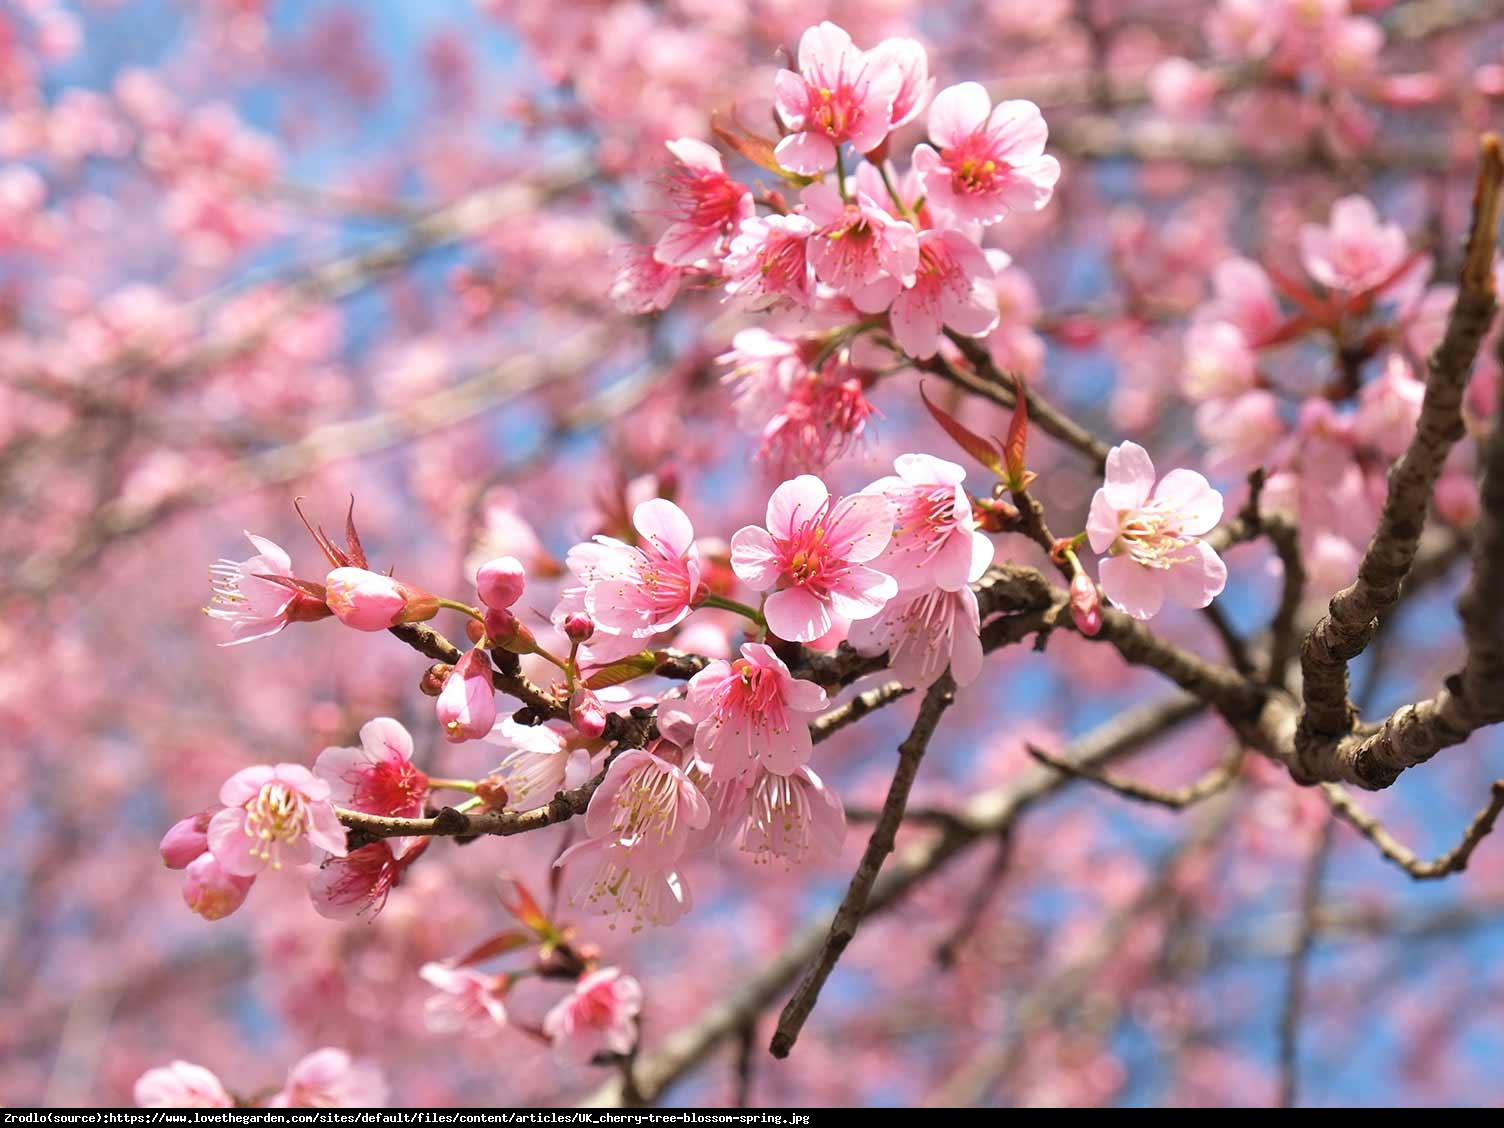 Wiśnia piłkowana Pink Perfection - Prunus serrulata Pink Perfection